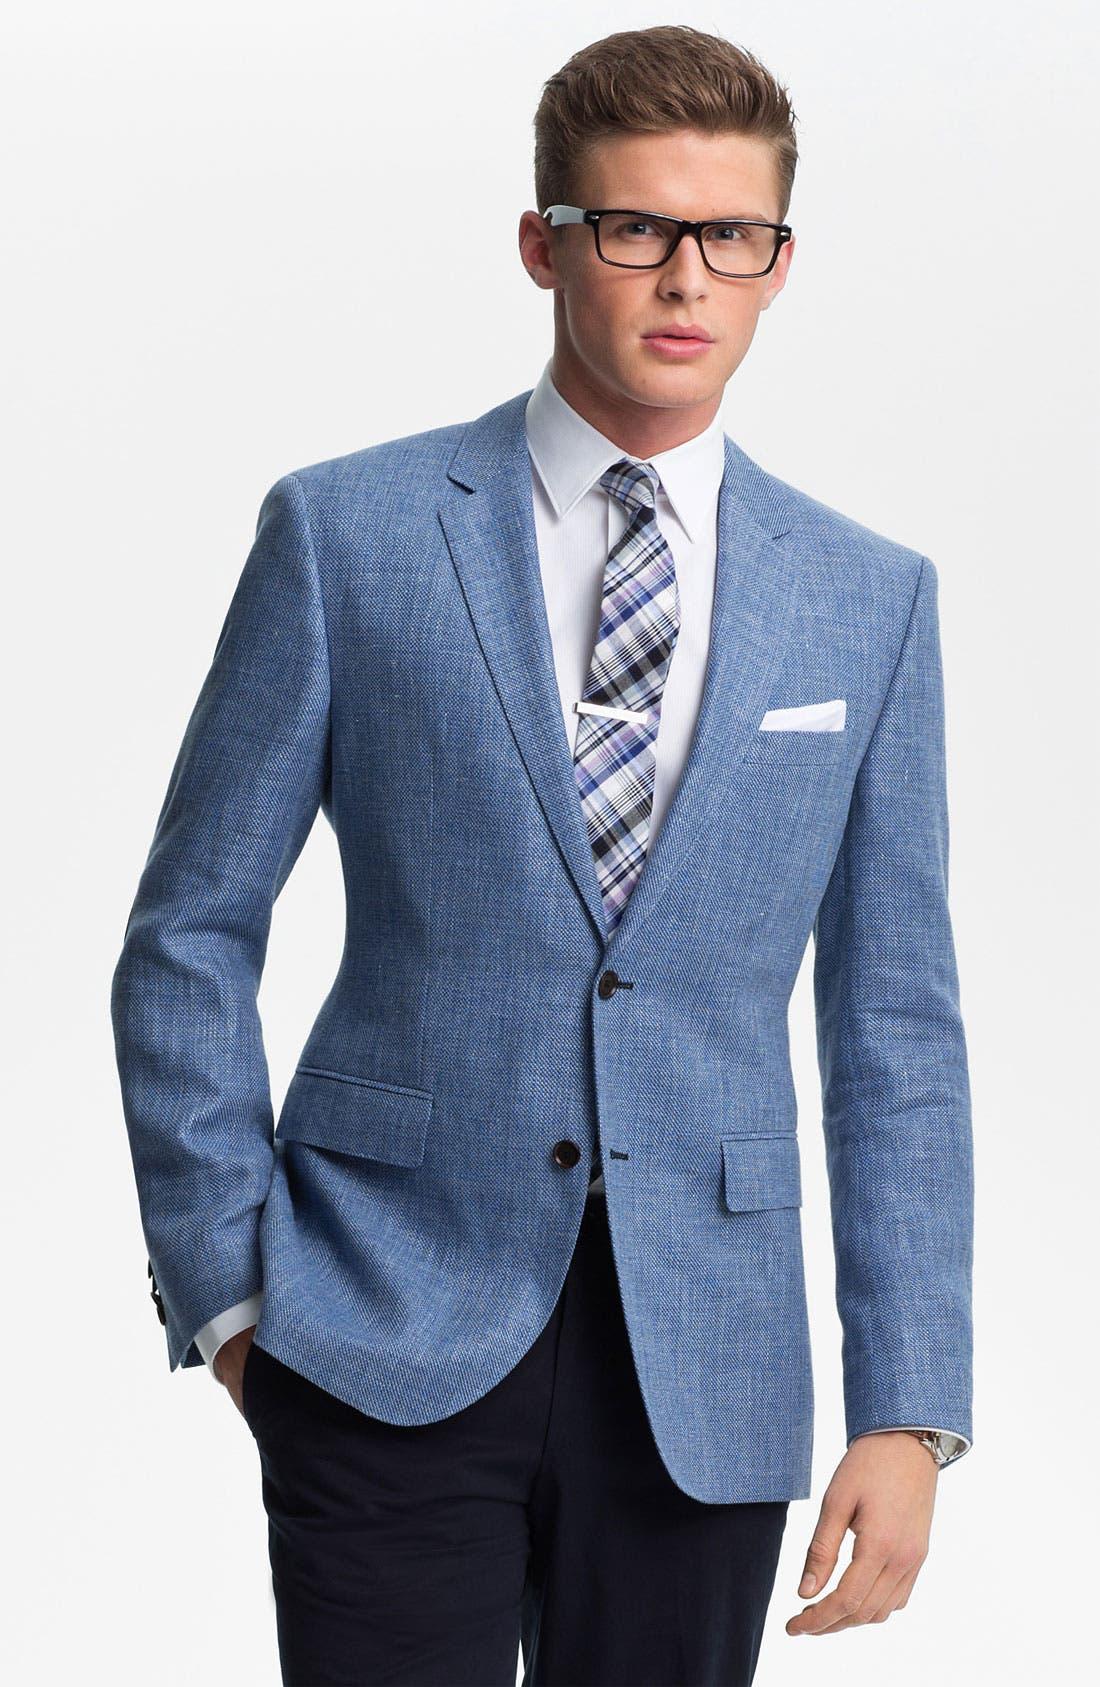 ZZDNUHUGO BOSS BOSS Black 'Smith' Trim Fit Sportcoat, Main, color, 440